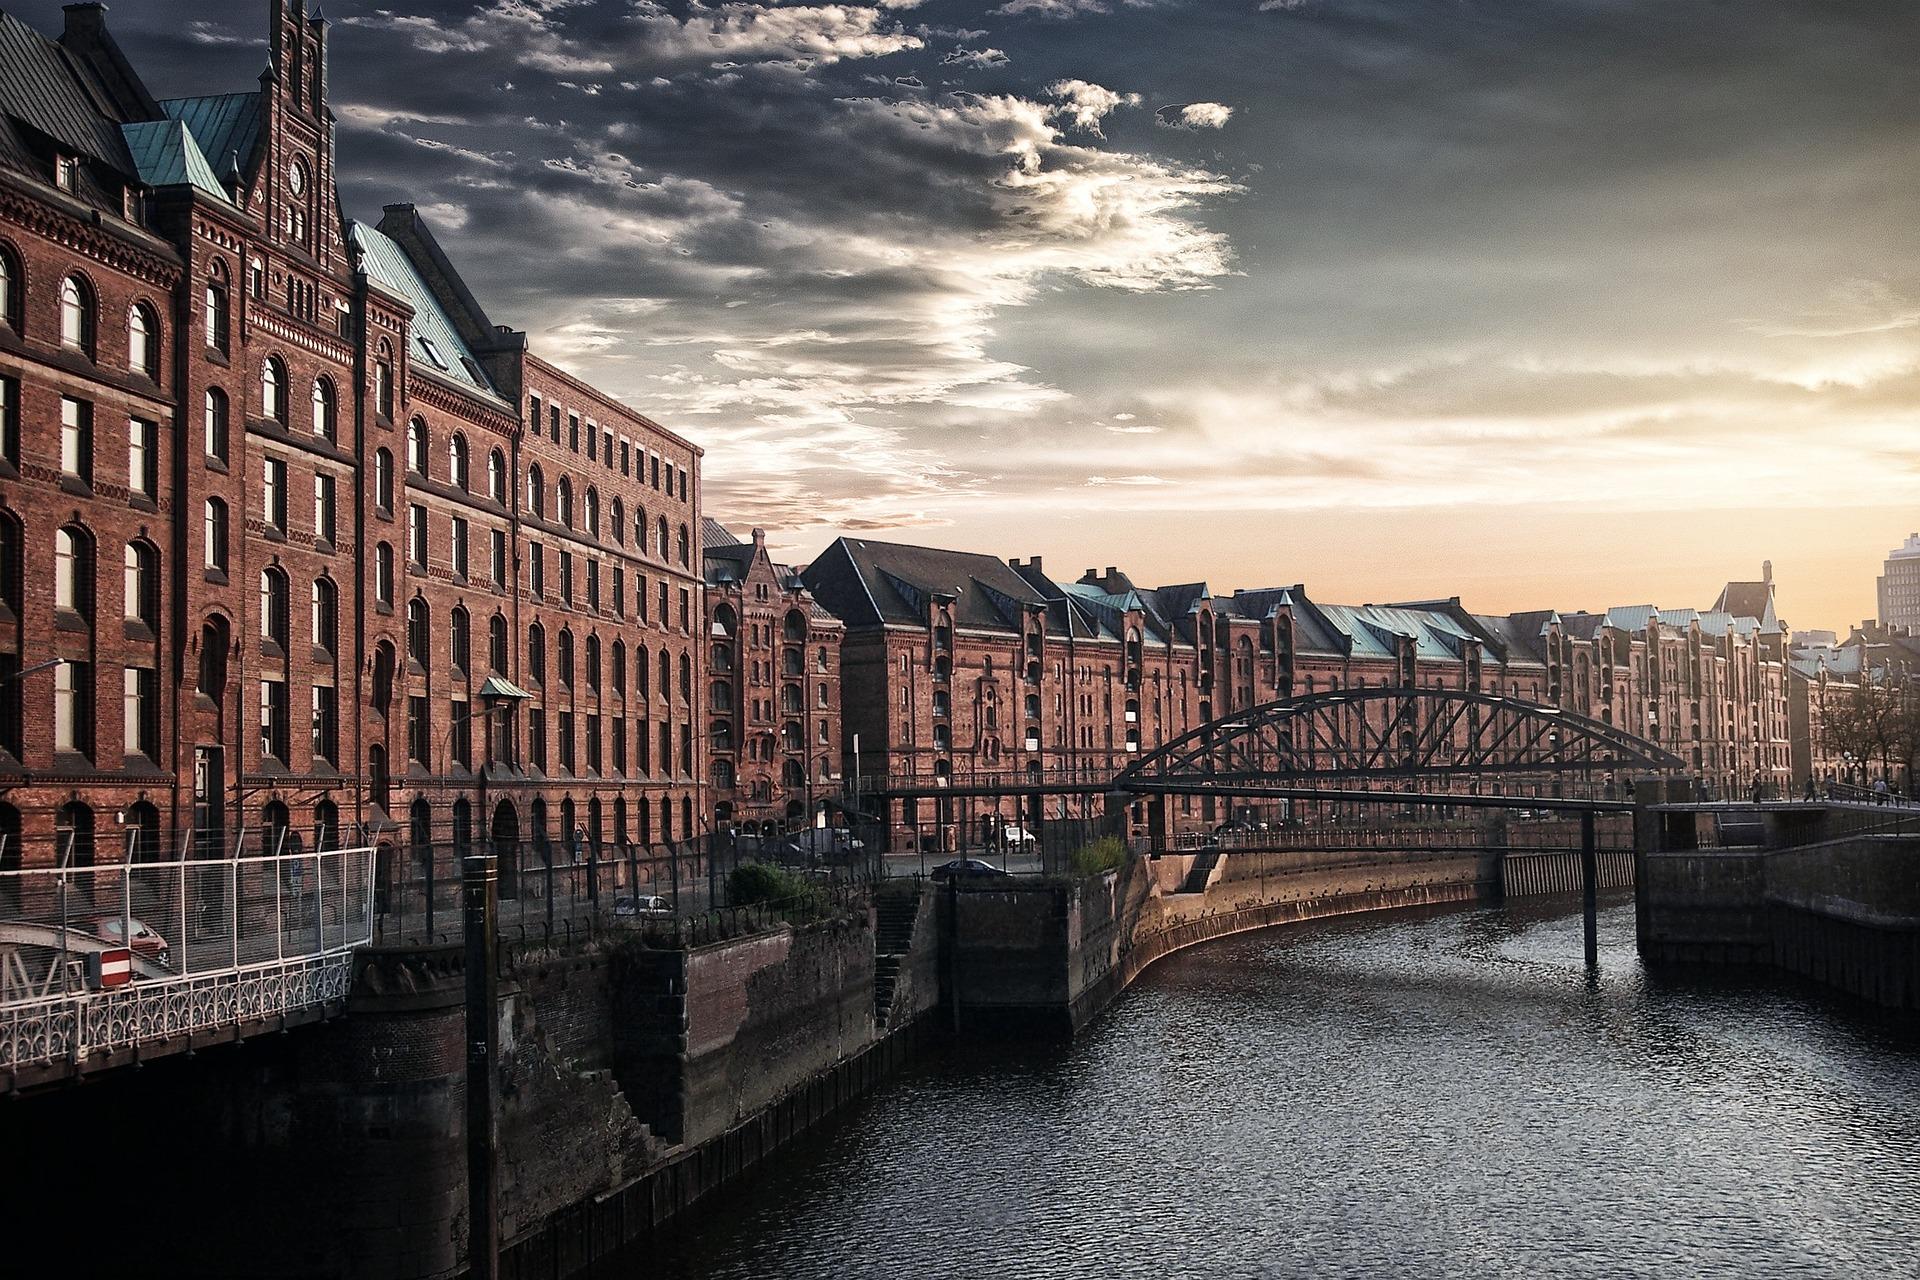 Città, Fiume, Ponte, Cielo, Hamburgo - Sfondi HD - Professor-falken.com